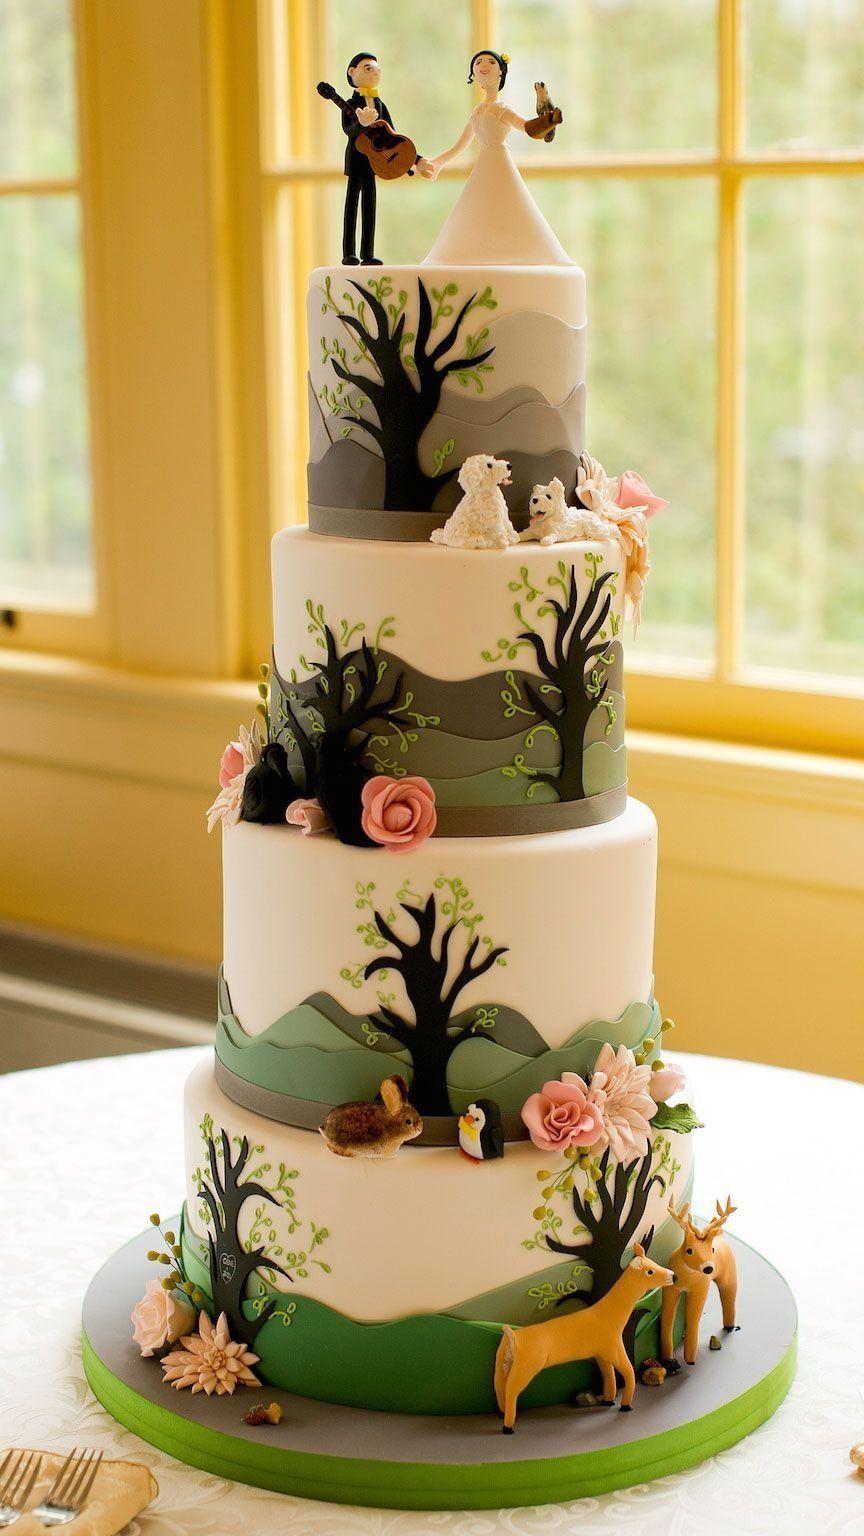 Jess and Gene\'s Unique Zoo Wedding | Unique weddings, Zoos and ...